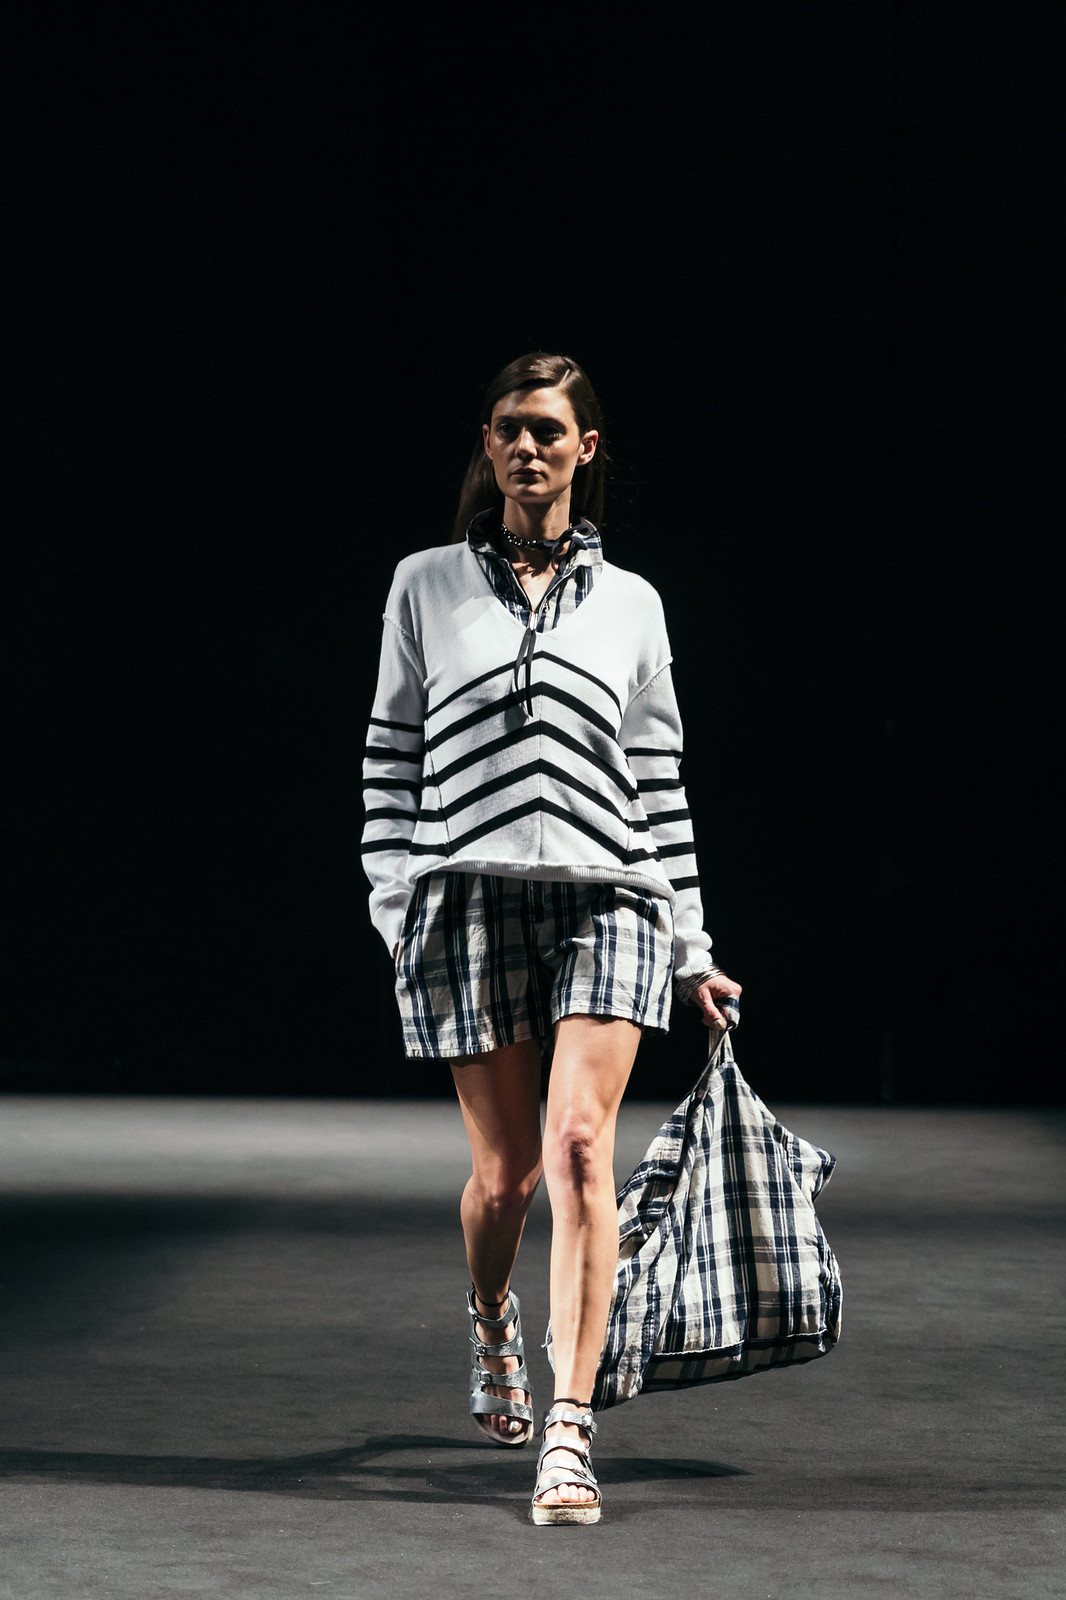 Jessie Chanes - Seams for a desire - 080 Bacelona Fashion #080bcnfasion -34